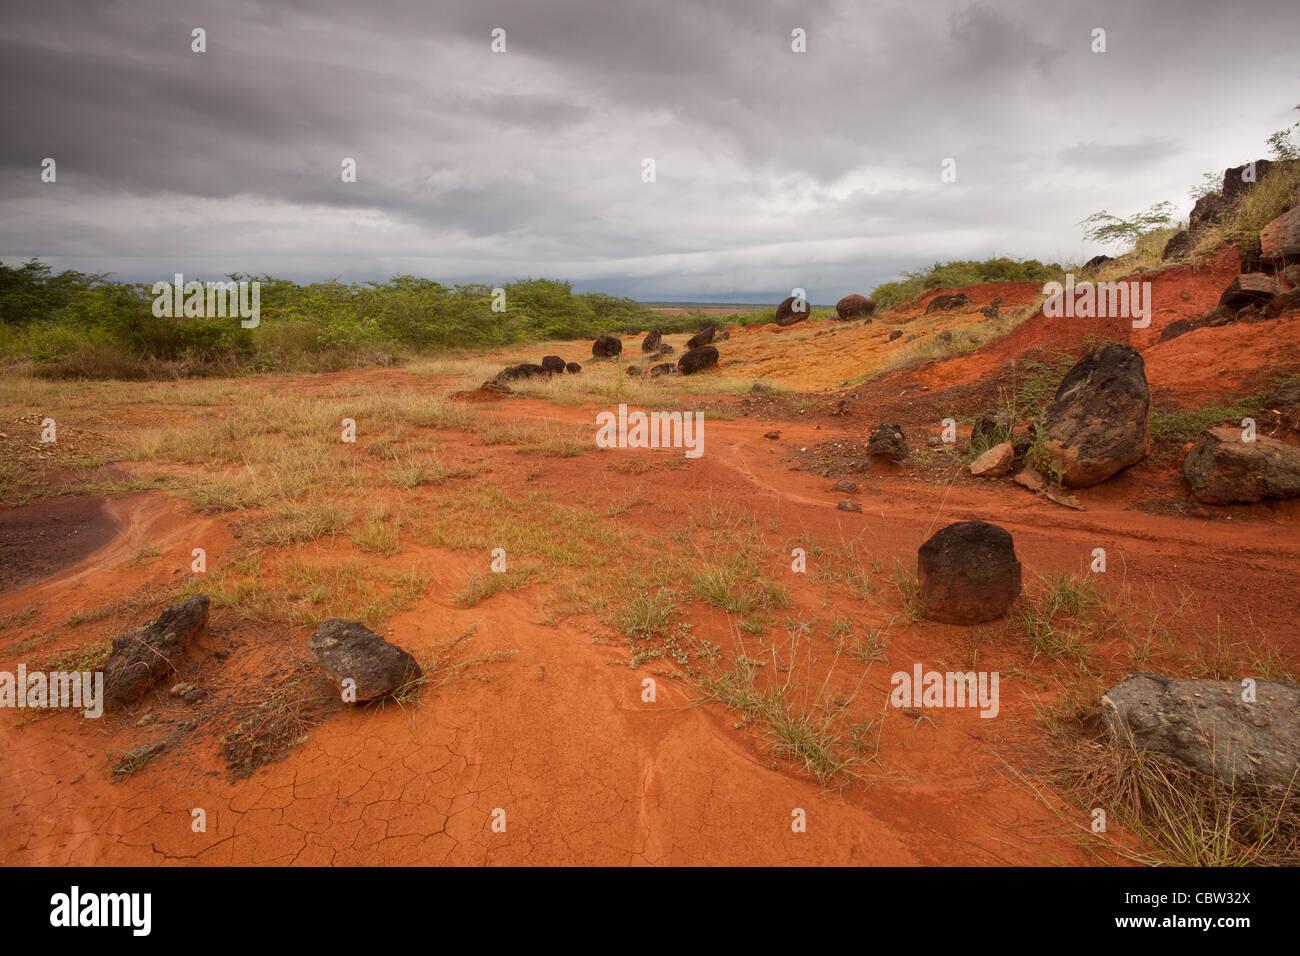 Landscape at Sarigua national park, Herrera province, Republic of Panama. - Stock Image